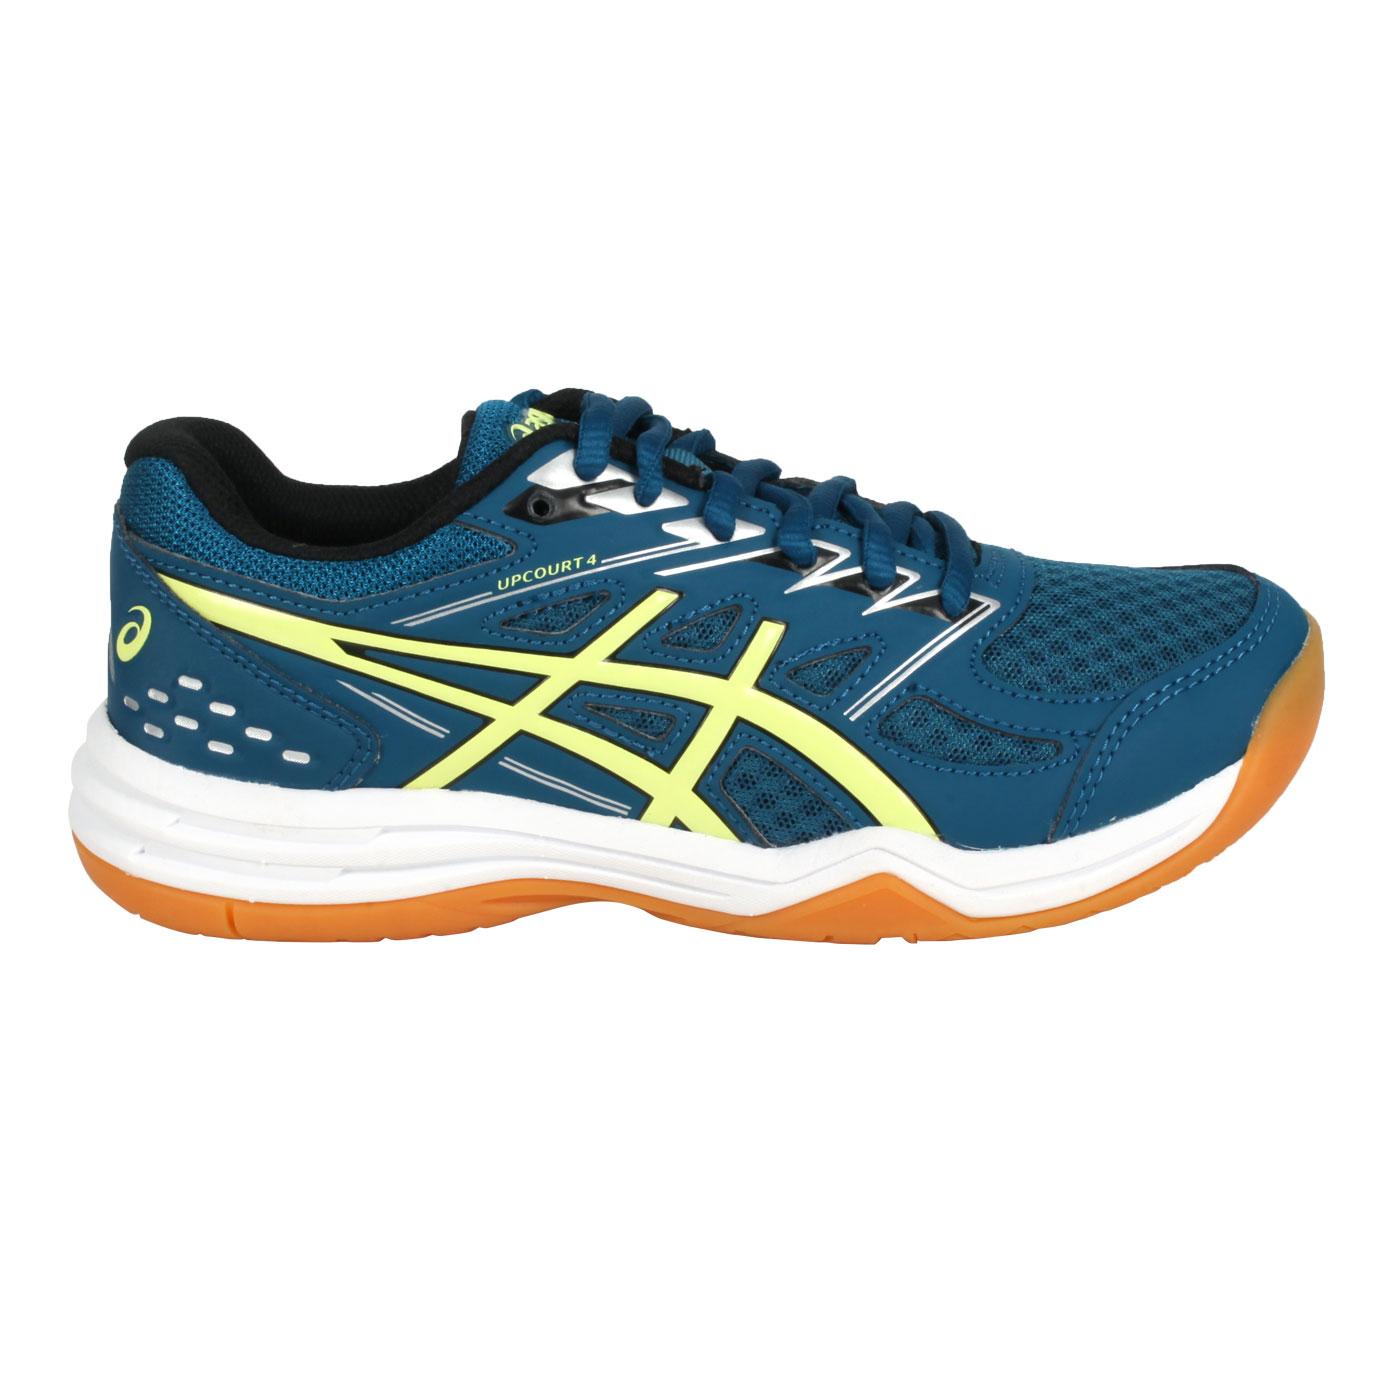 ASICS 大童排羽球鞋  @UPCOURT 4 GS@1074A027-404 - 藍綠黃